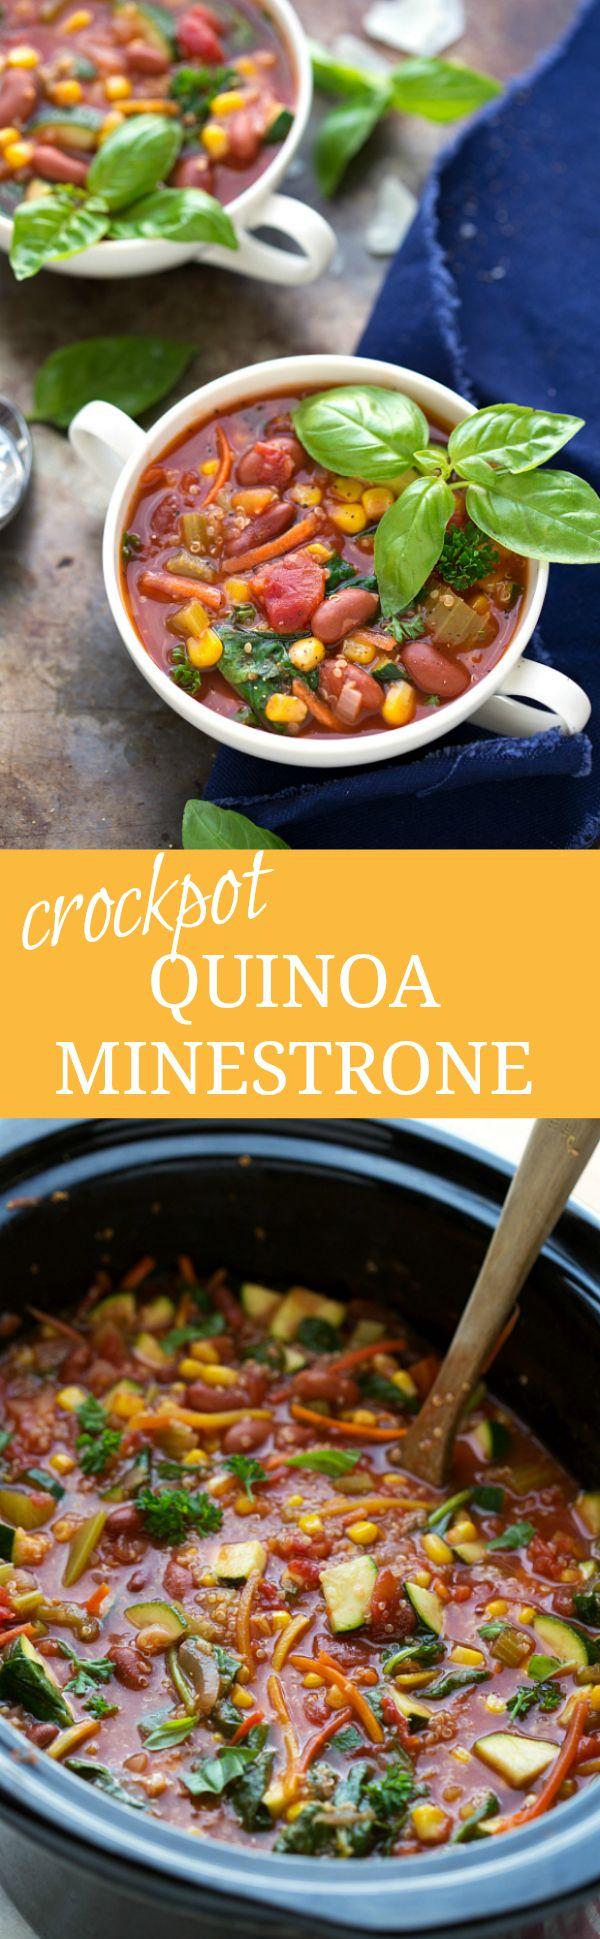 Easy Crockpot Quinoa Minestrone